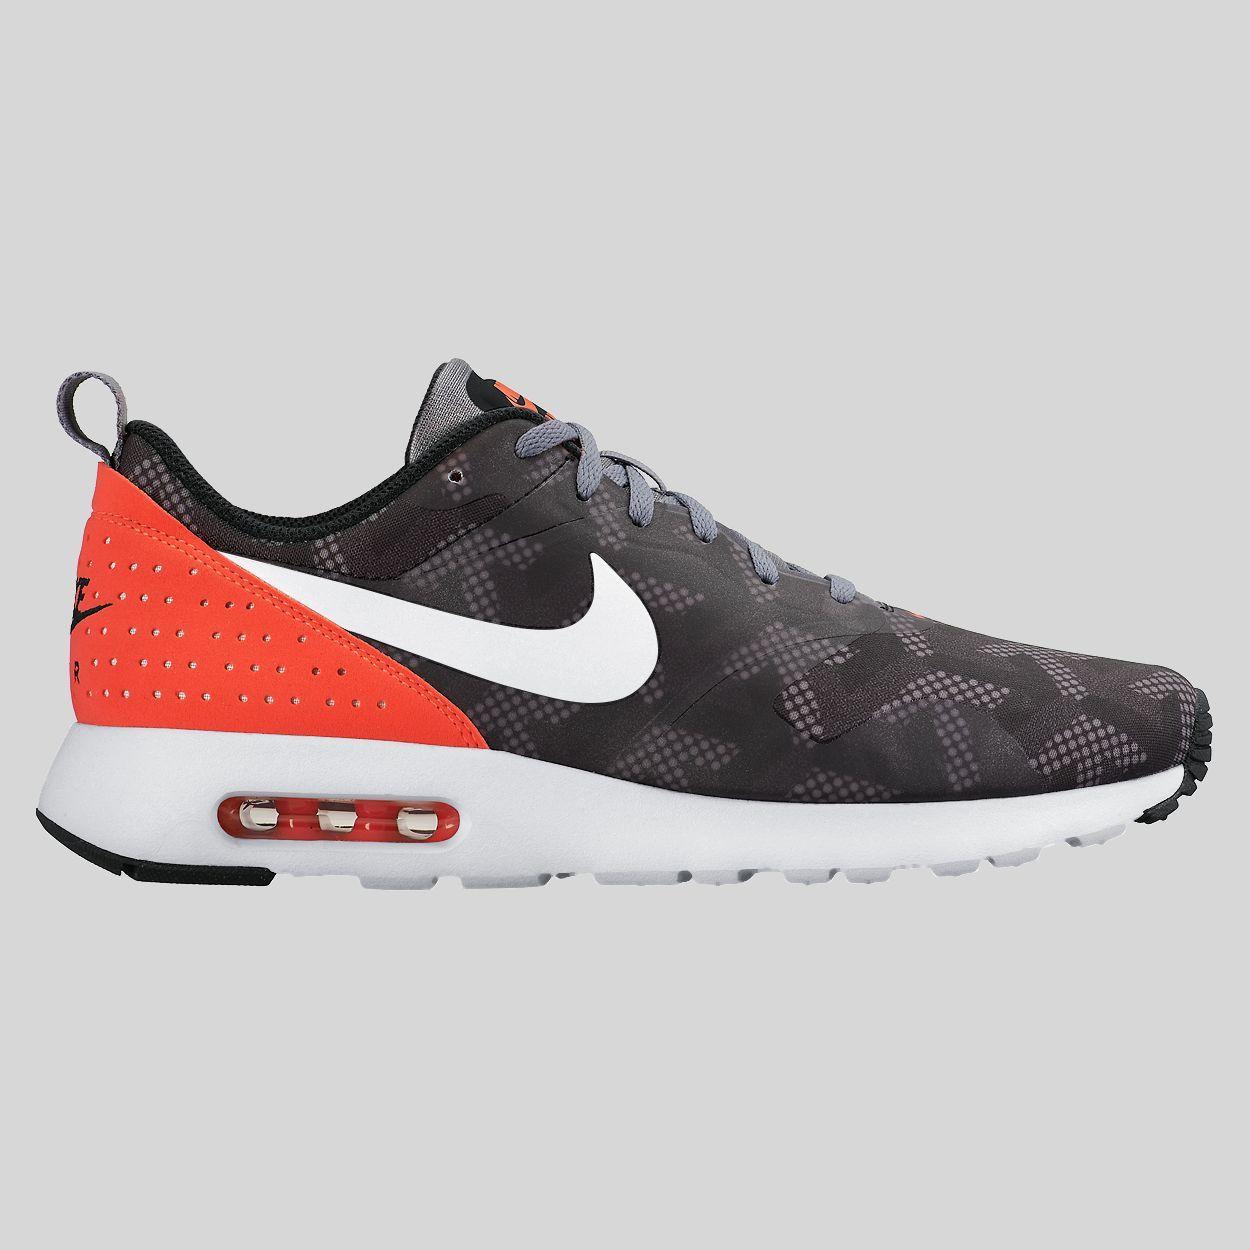 Nike Air Max Tavas SE Cool Grey Bright Crimson